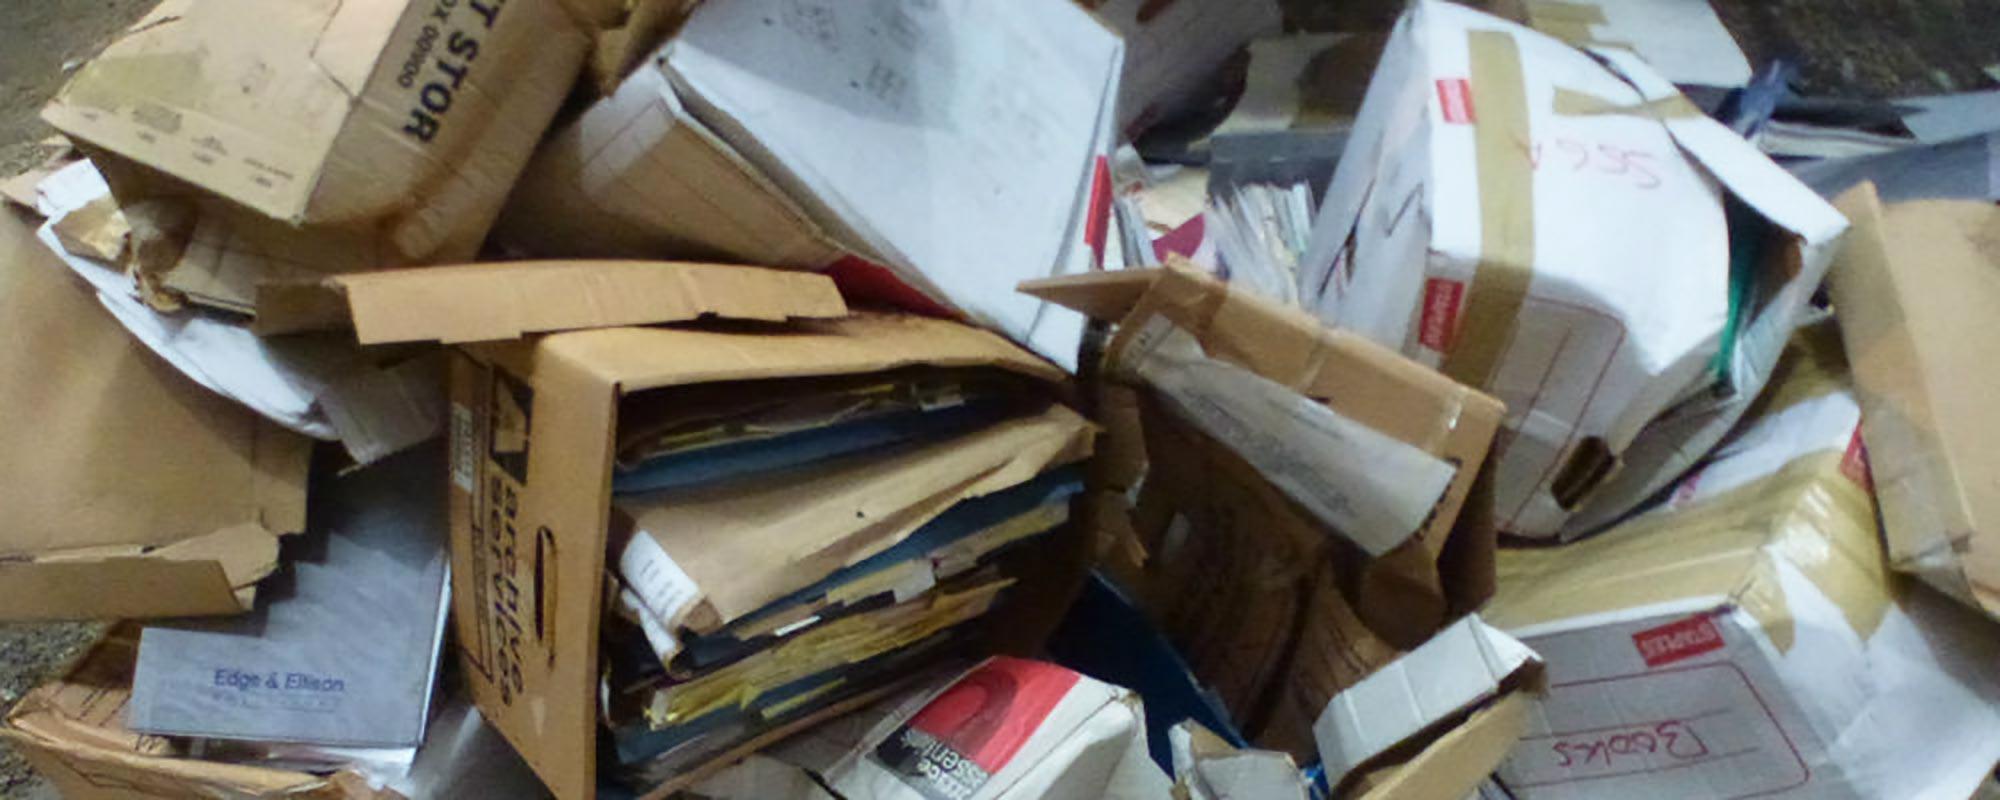 Confidential-data-shredding